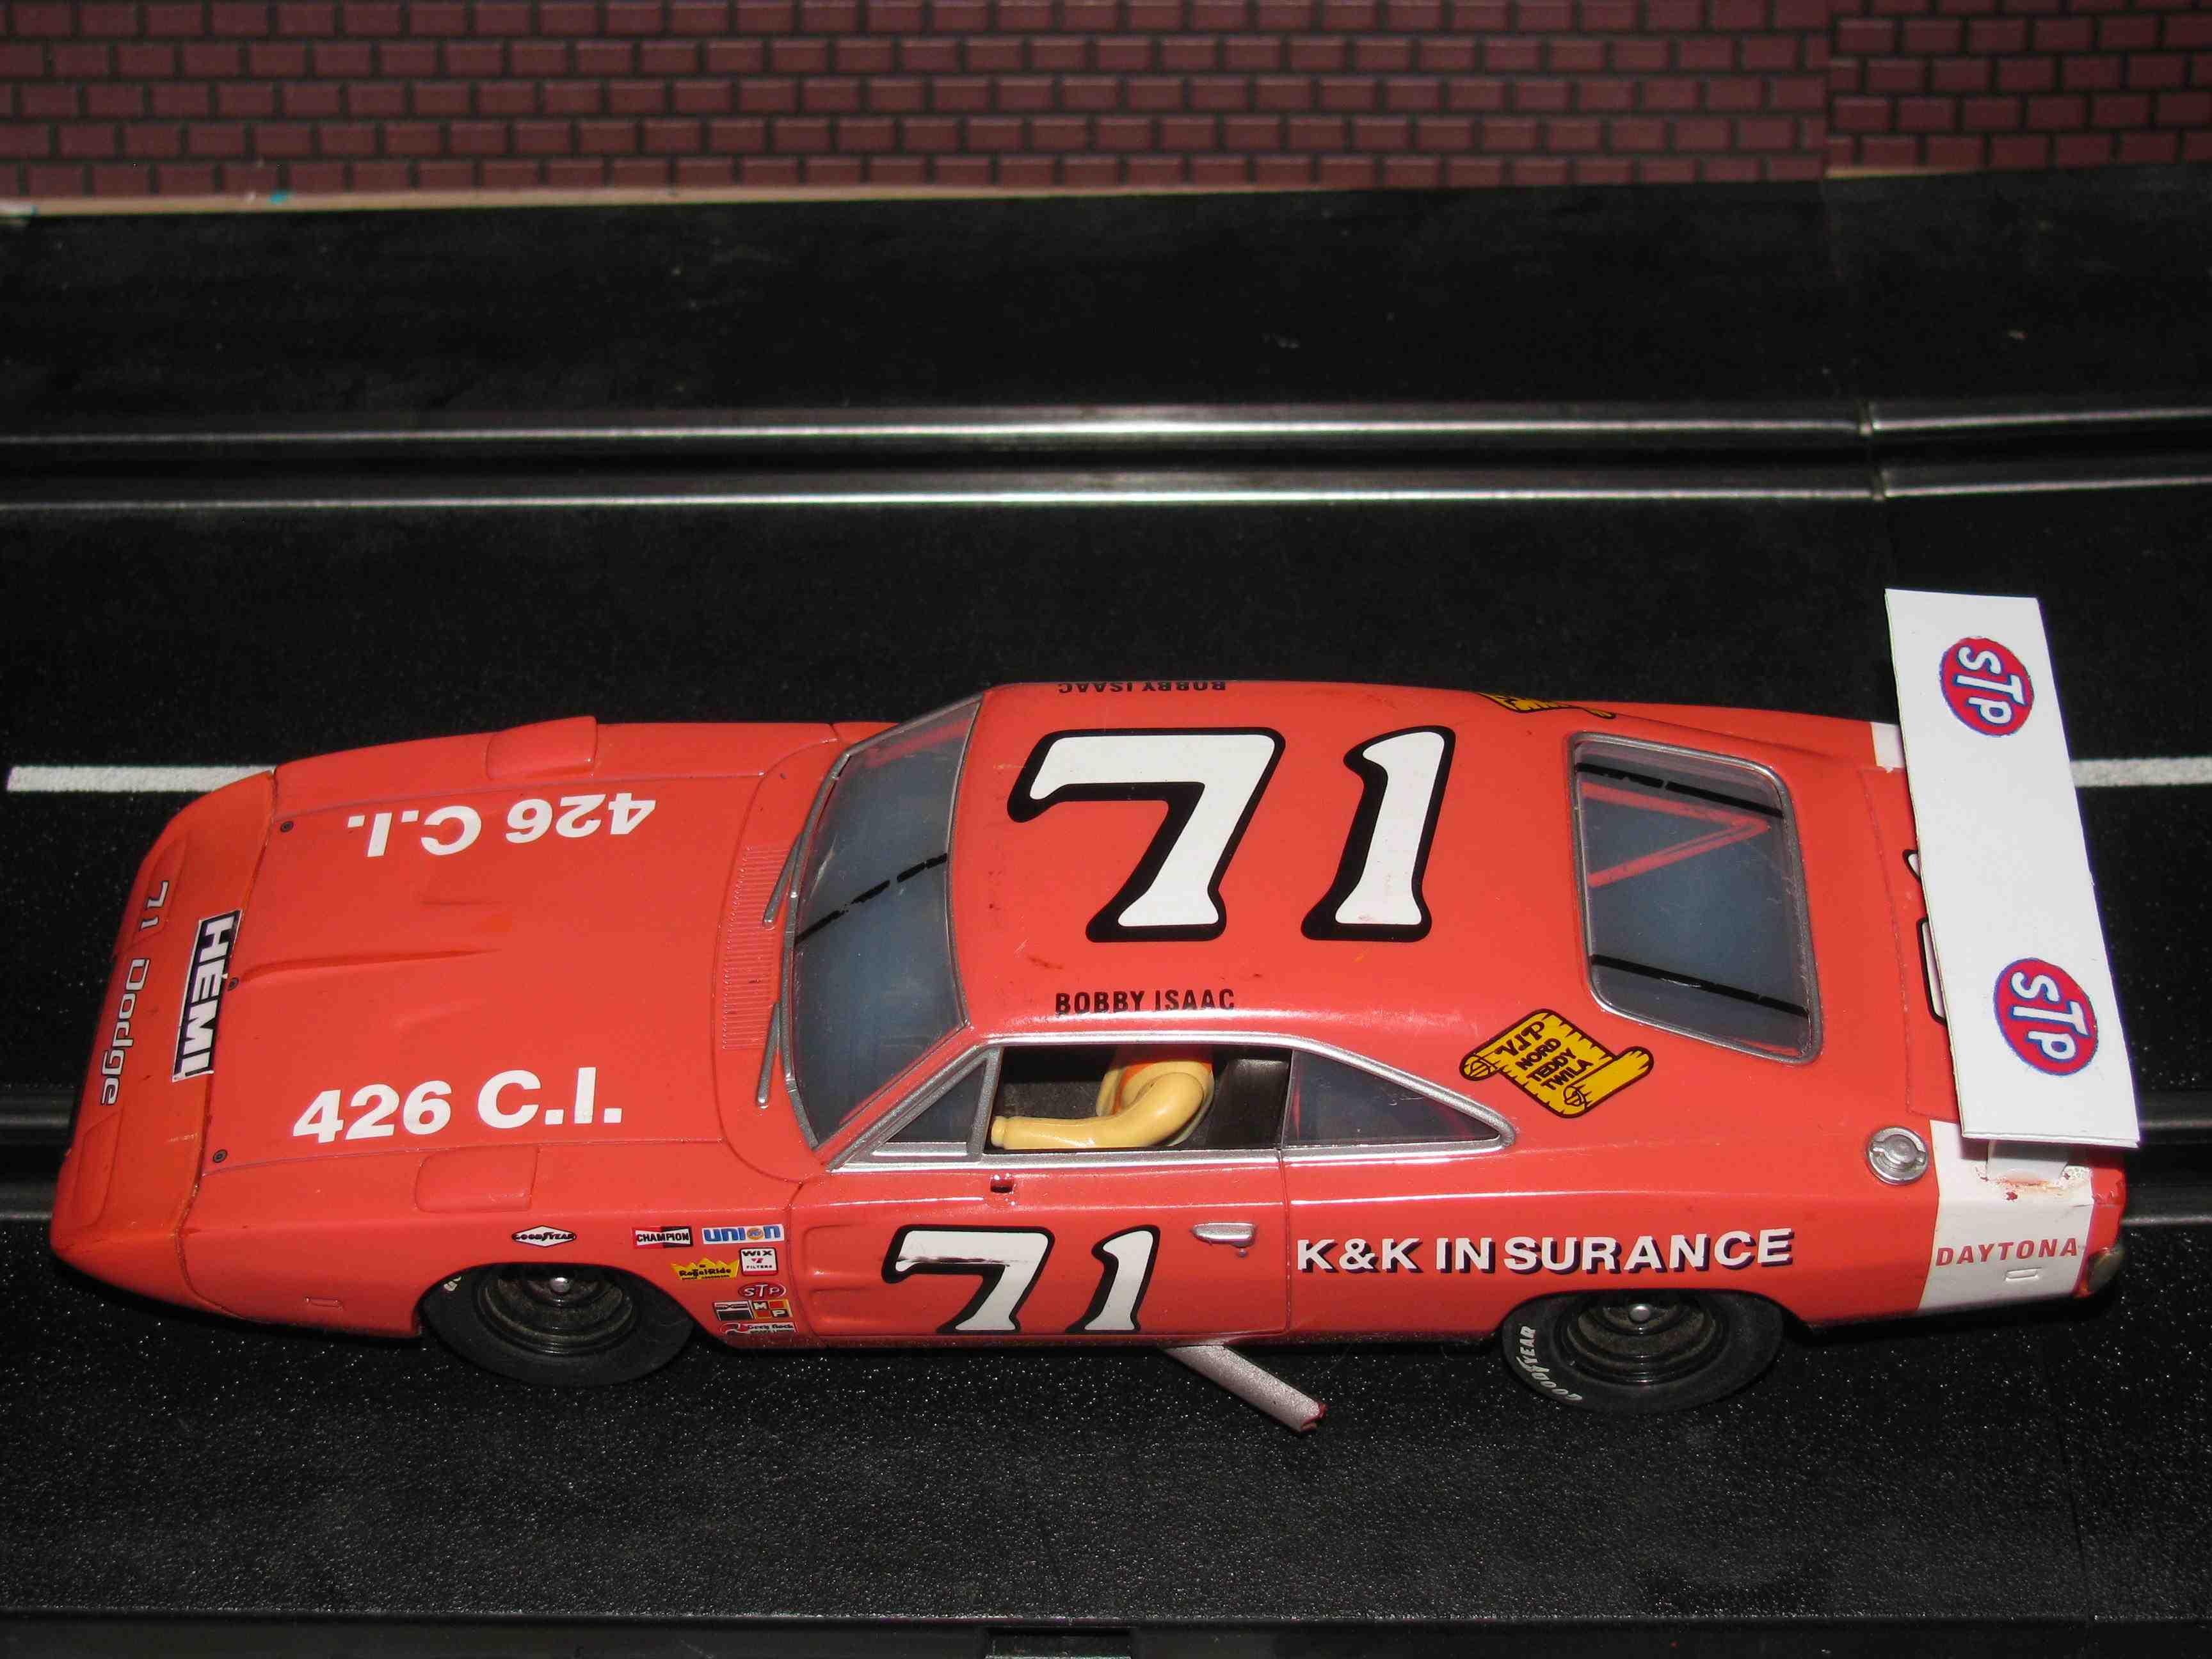 1969 Dodge Charger Daytona 426 HEMI Slot Car 1/32 Scale Carrera Evo